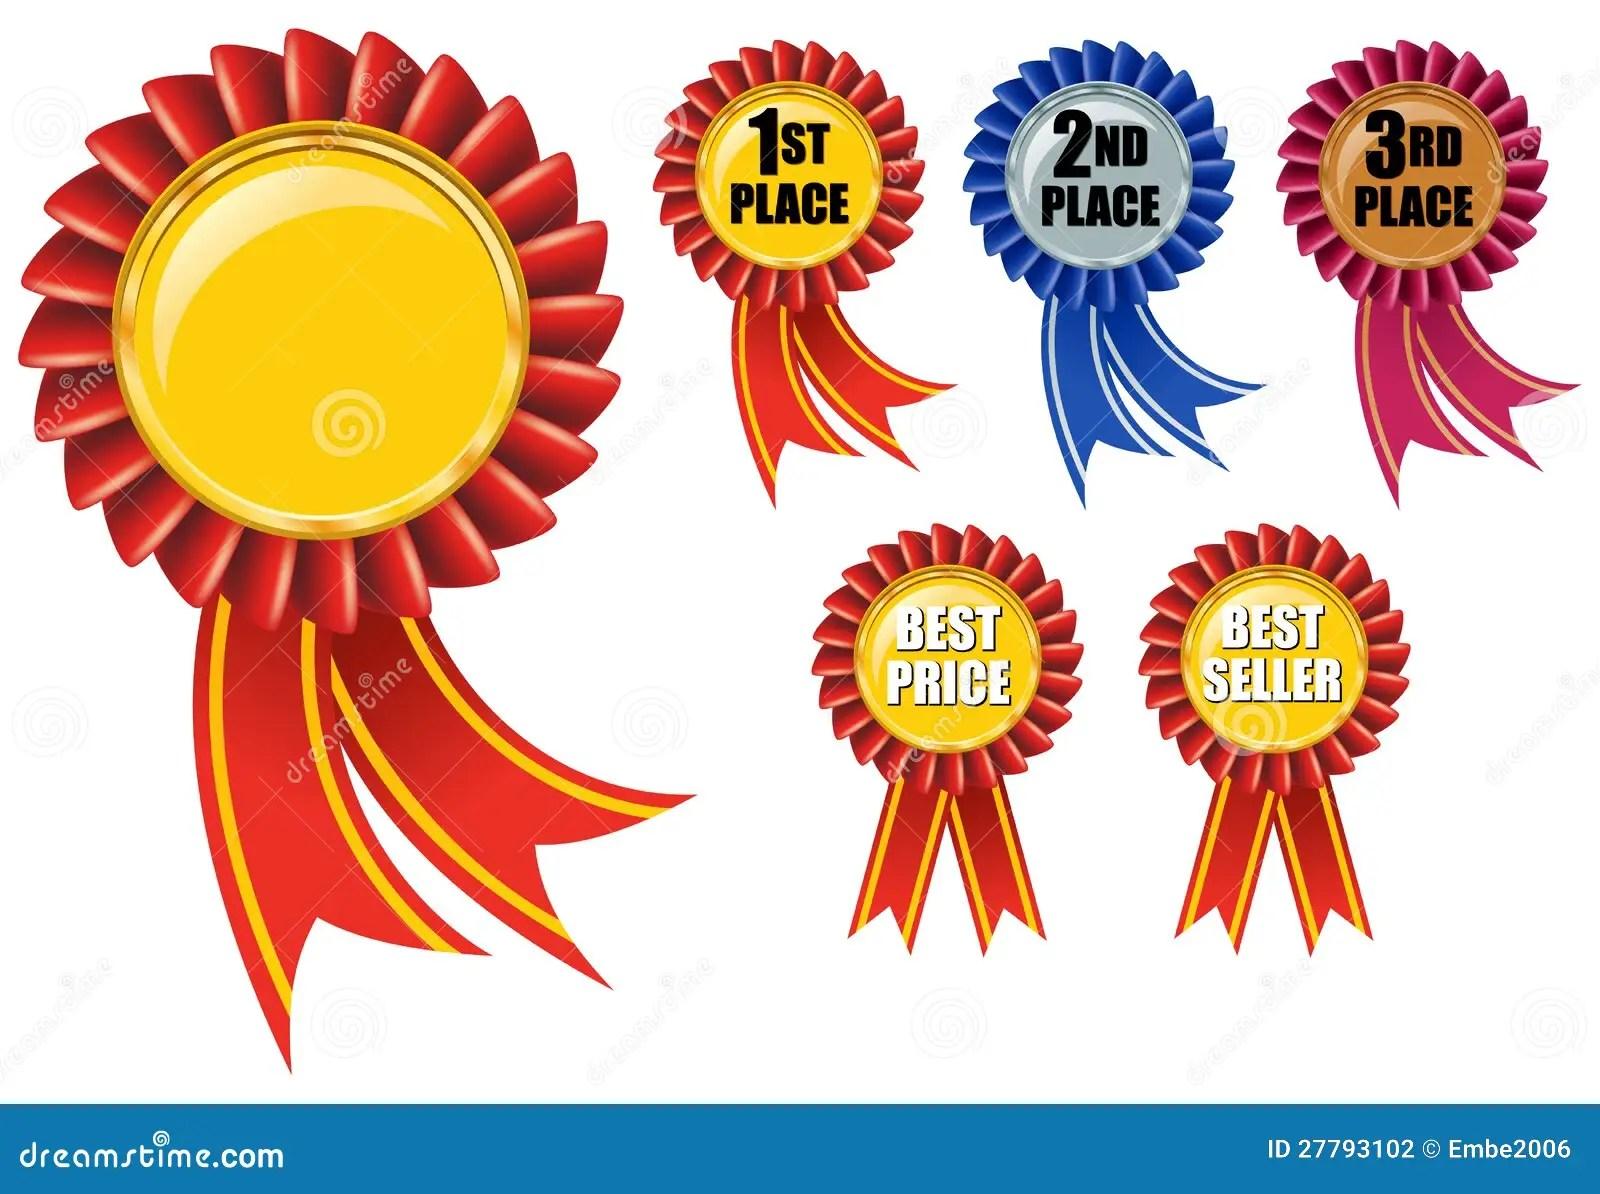 Ribbon Award Stock Vector Illustration Of Label Medal